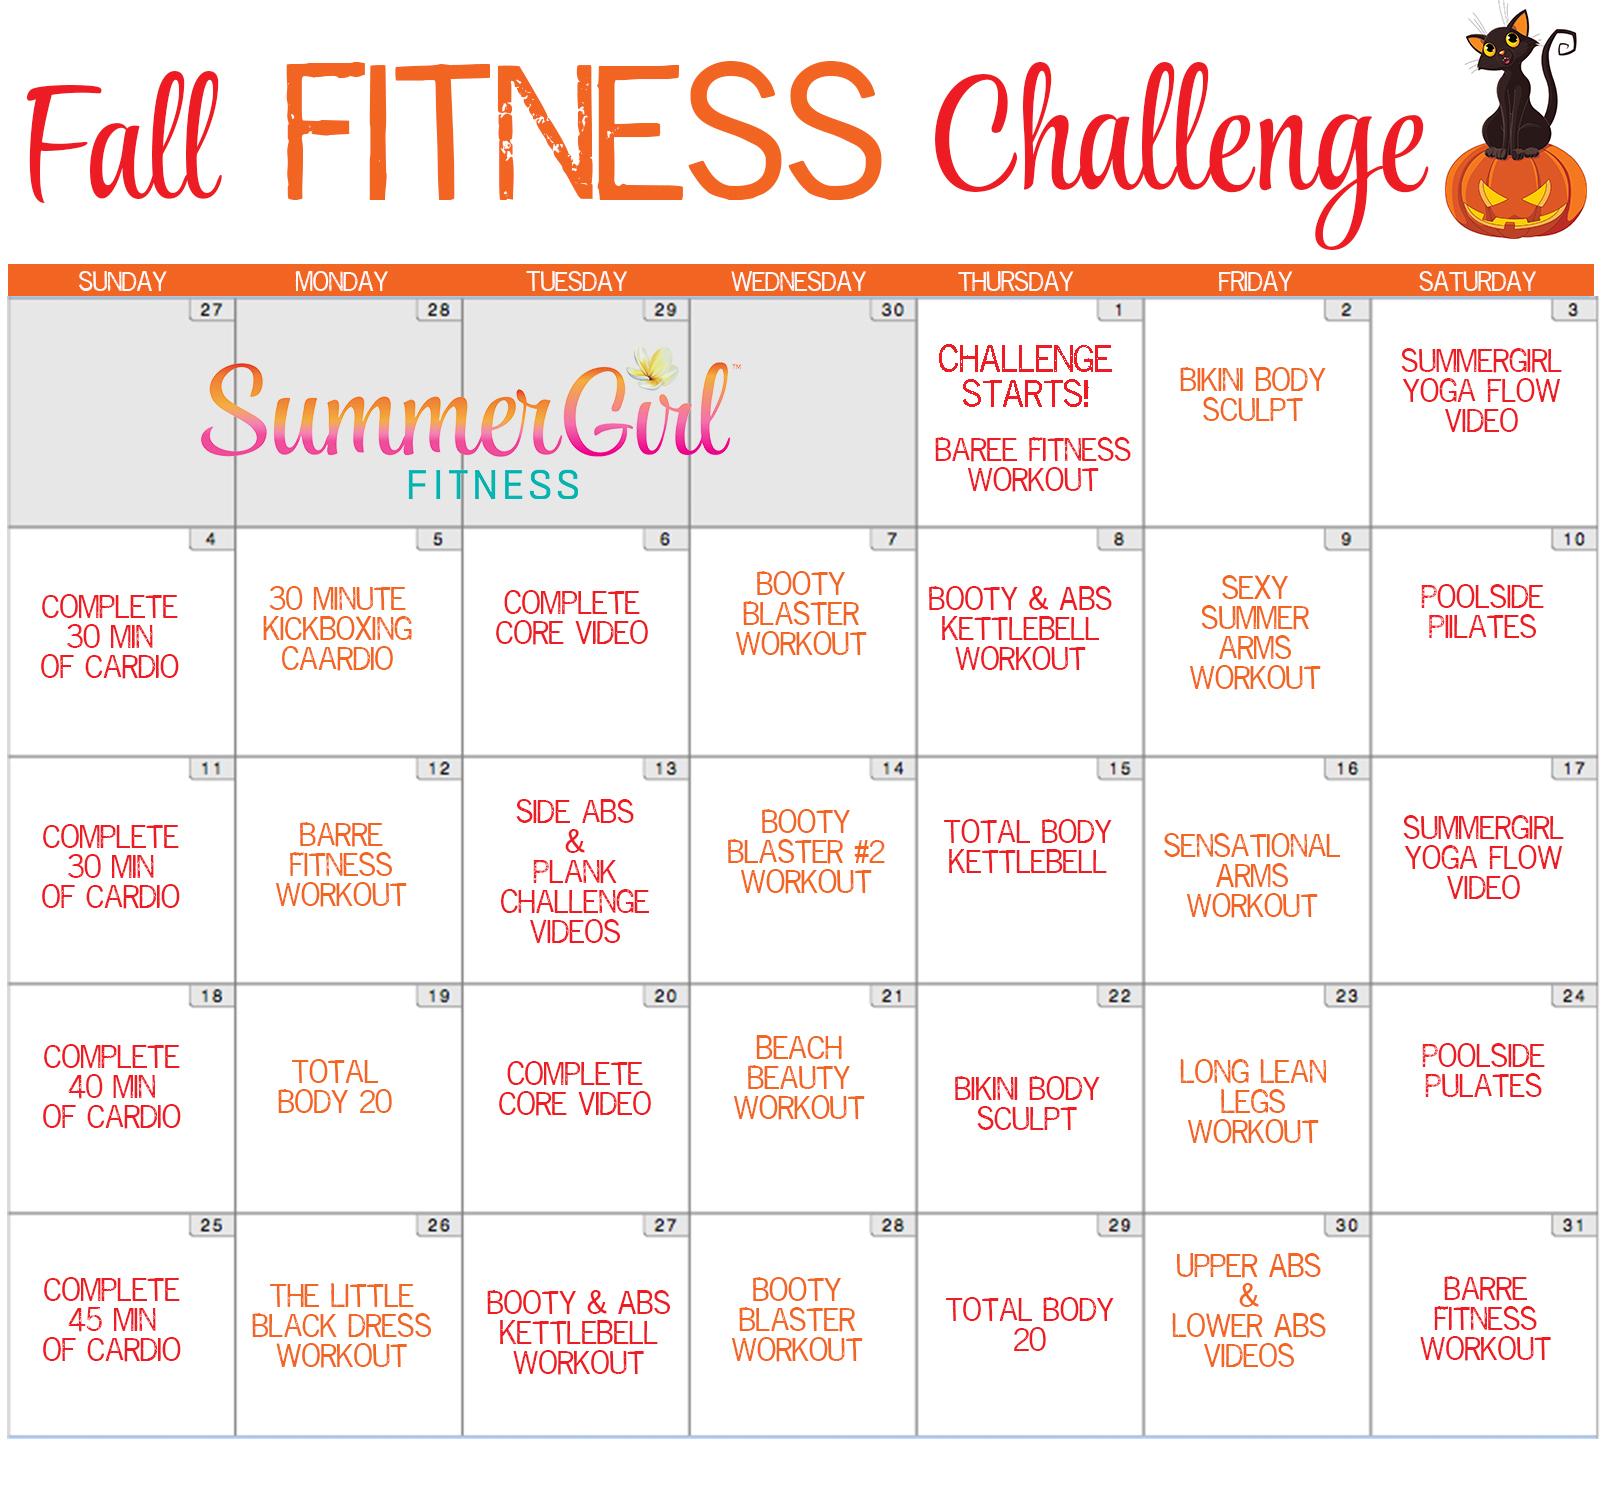 Fall Fitness Challenge Calendar | Summergirl Fitness Within Fitness Challenge Calendars For Students Pdf